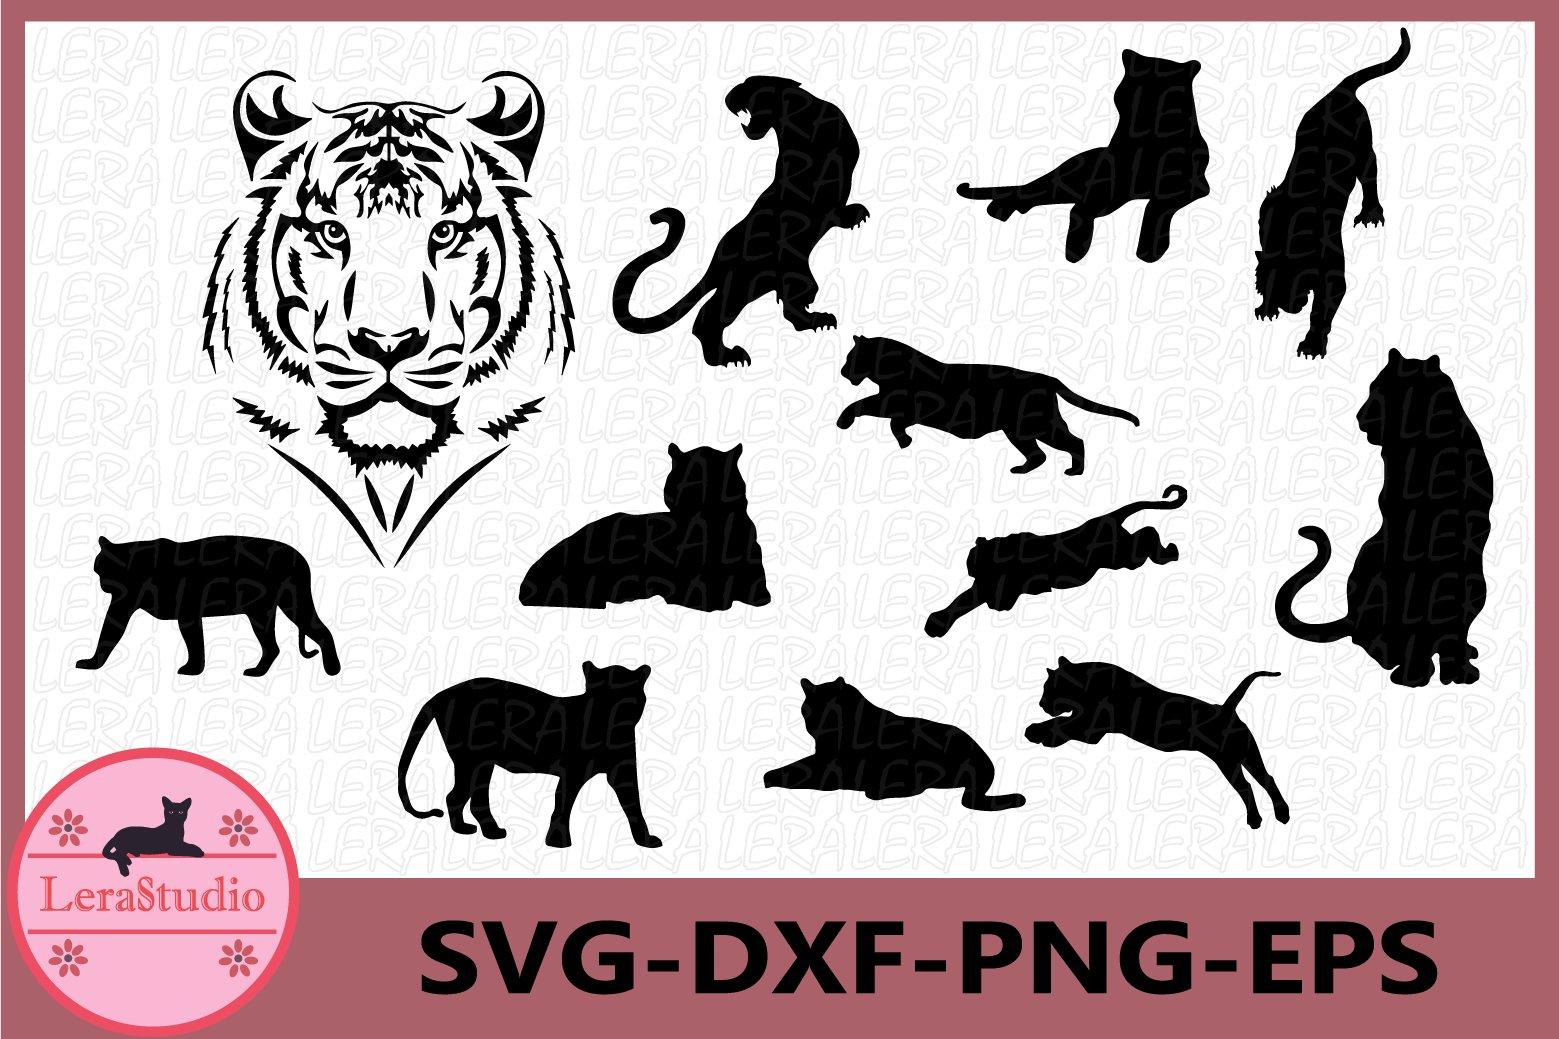 Tiger Silhouette Tiger Svg Tiger Clipart Animals 433142 Cut Files Design Bundles Ai (adobe illustrator) eps (encapsulated postscript). tiger silhouette tiger svg tiger clipart animals